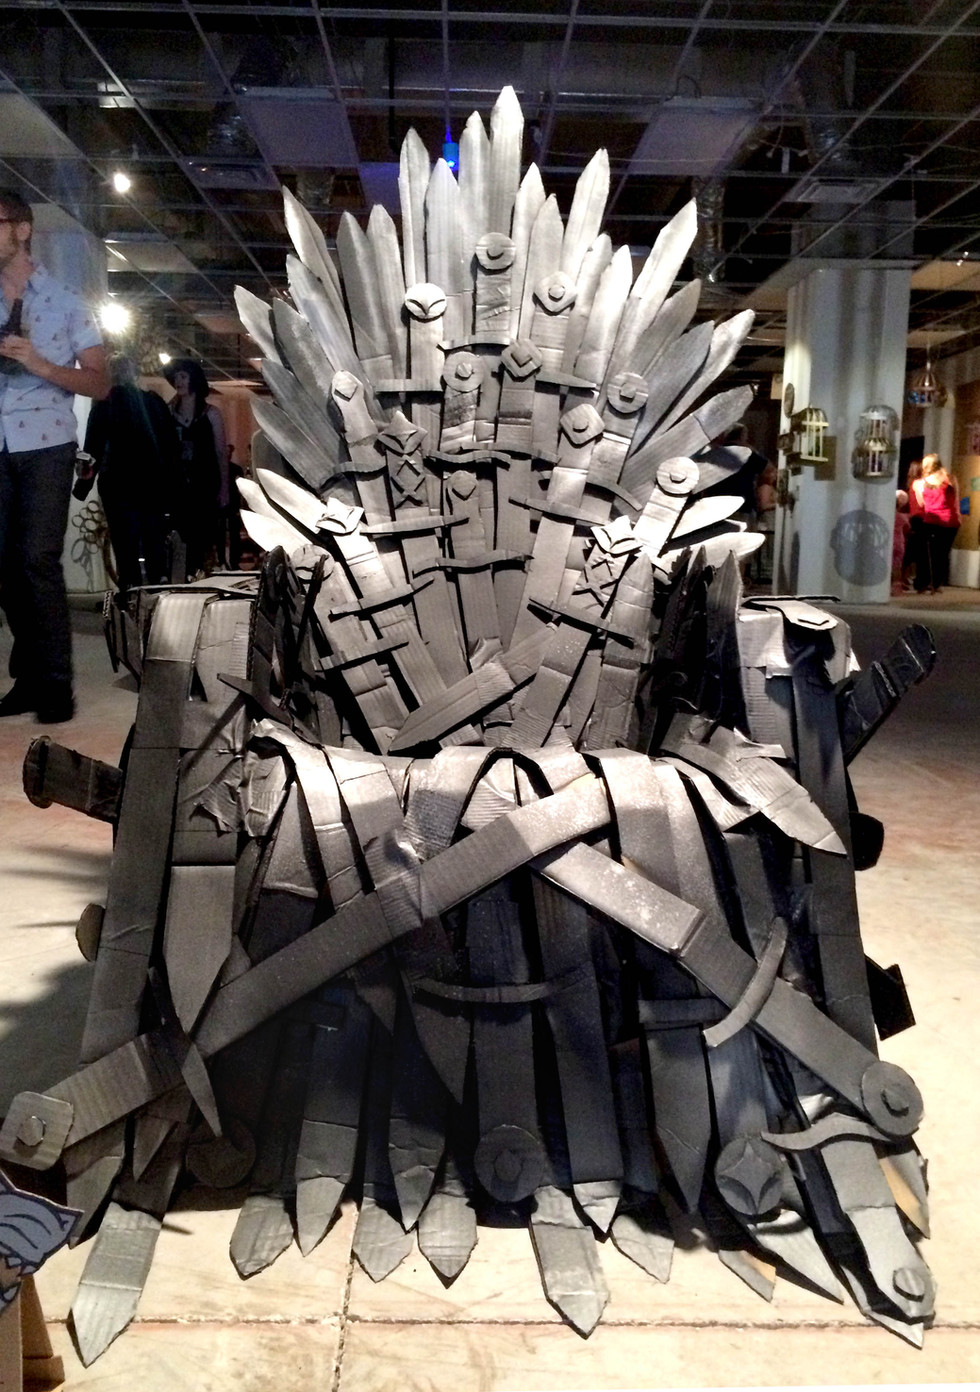 The Cardboard Throne